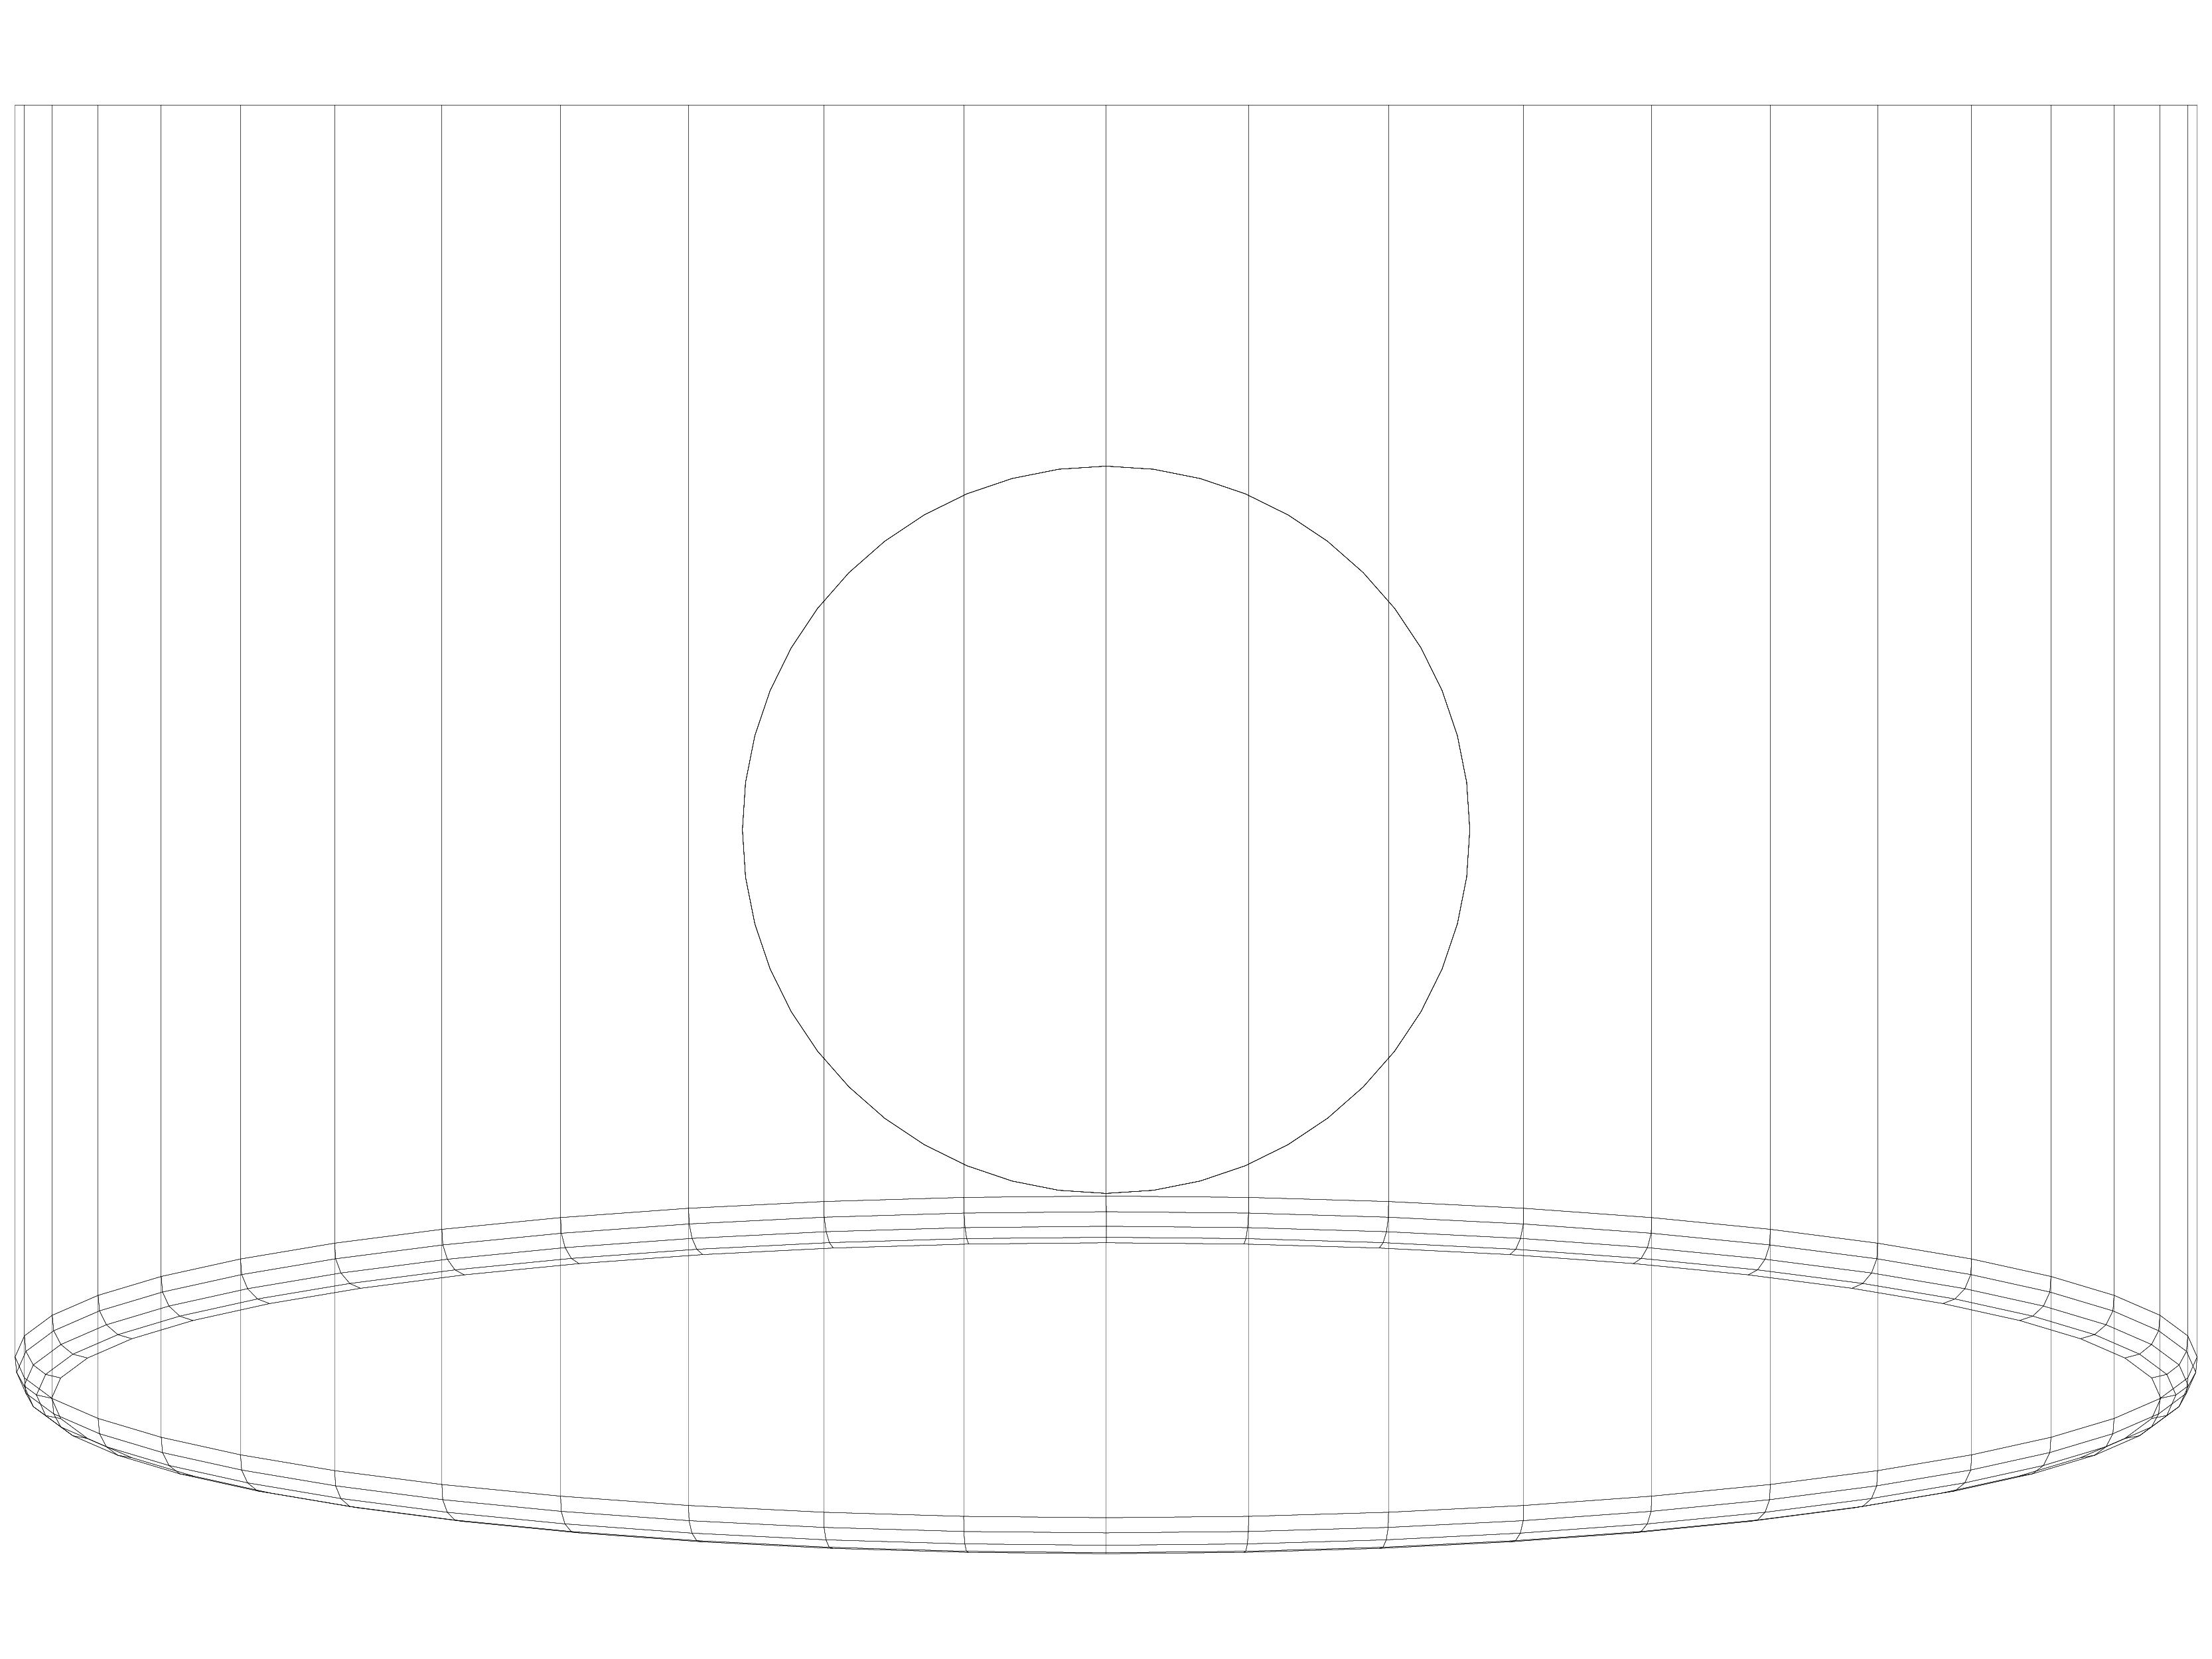 Pagina 1 - CAD-DWG Cot de perete PURIS SCHELL Detaliu de produs Racorduri de perete